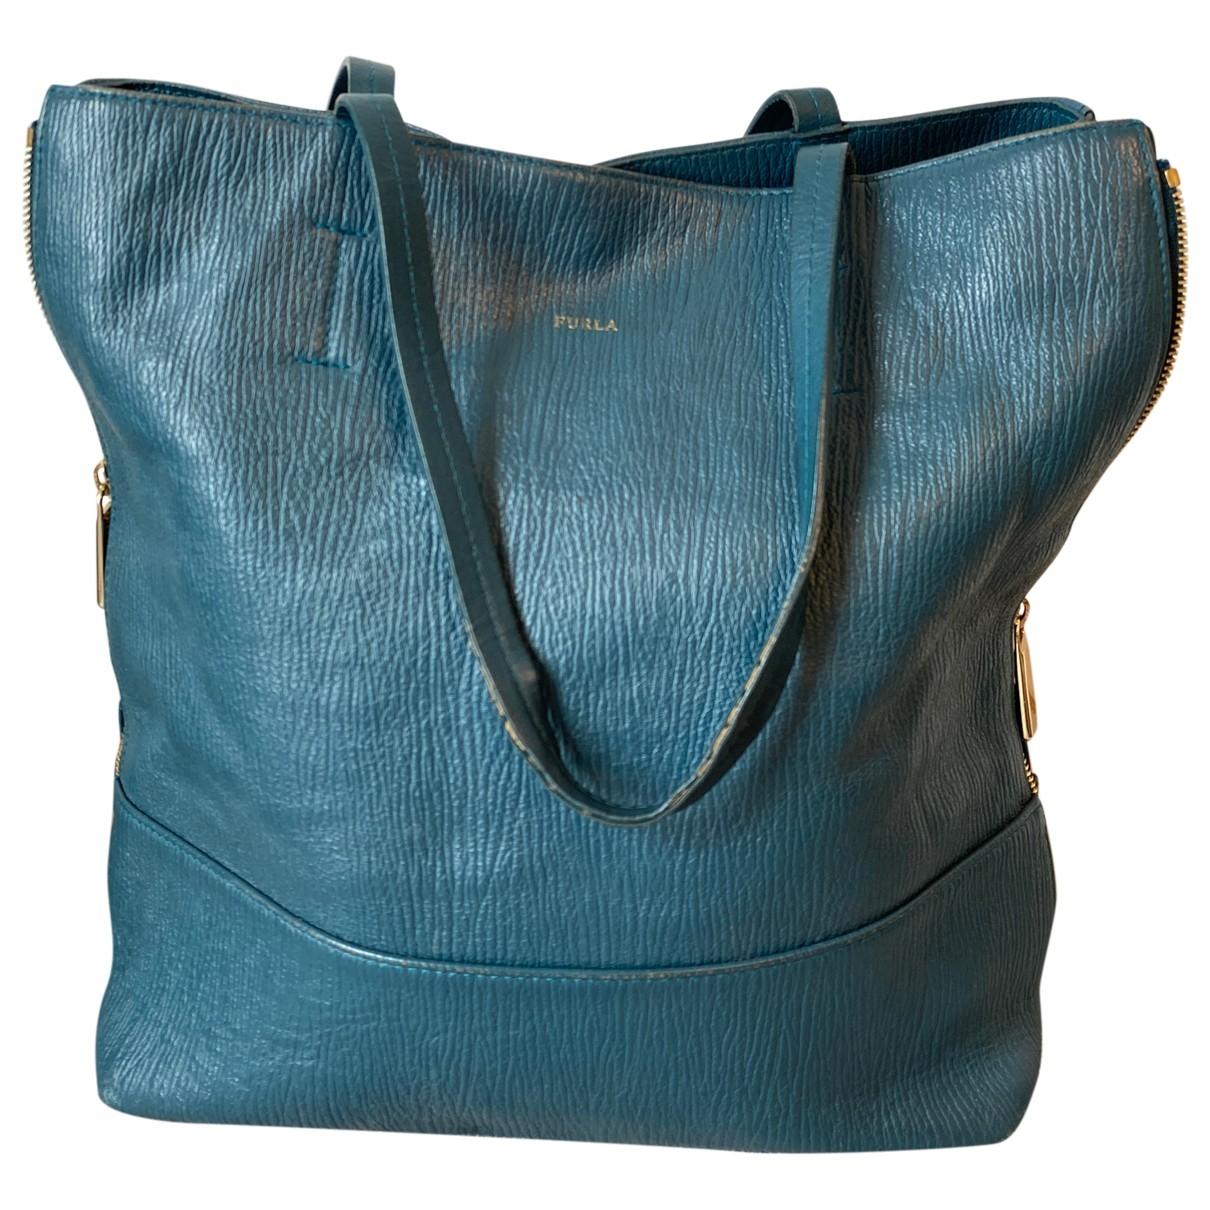 Furla \N Turquoise Leather handbag for Women \N